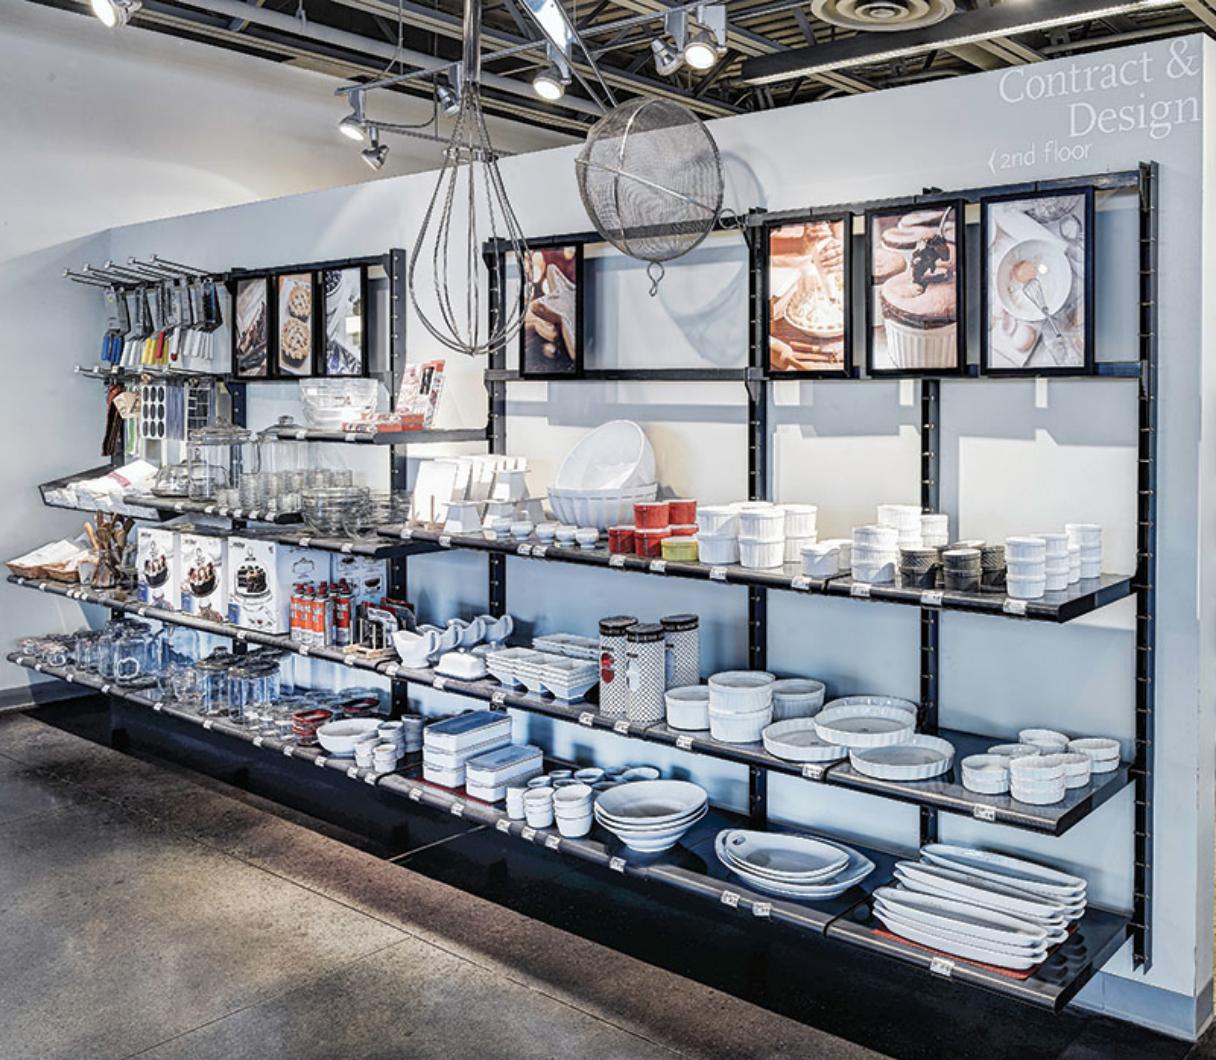 Boelter Superstore Retail Displays Small Restaurant Design Commercial Kitchen Equipment Retail Shop Design